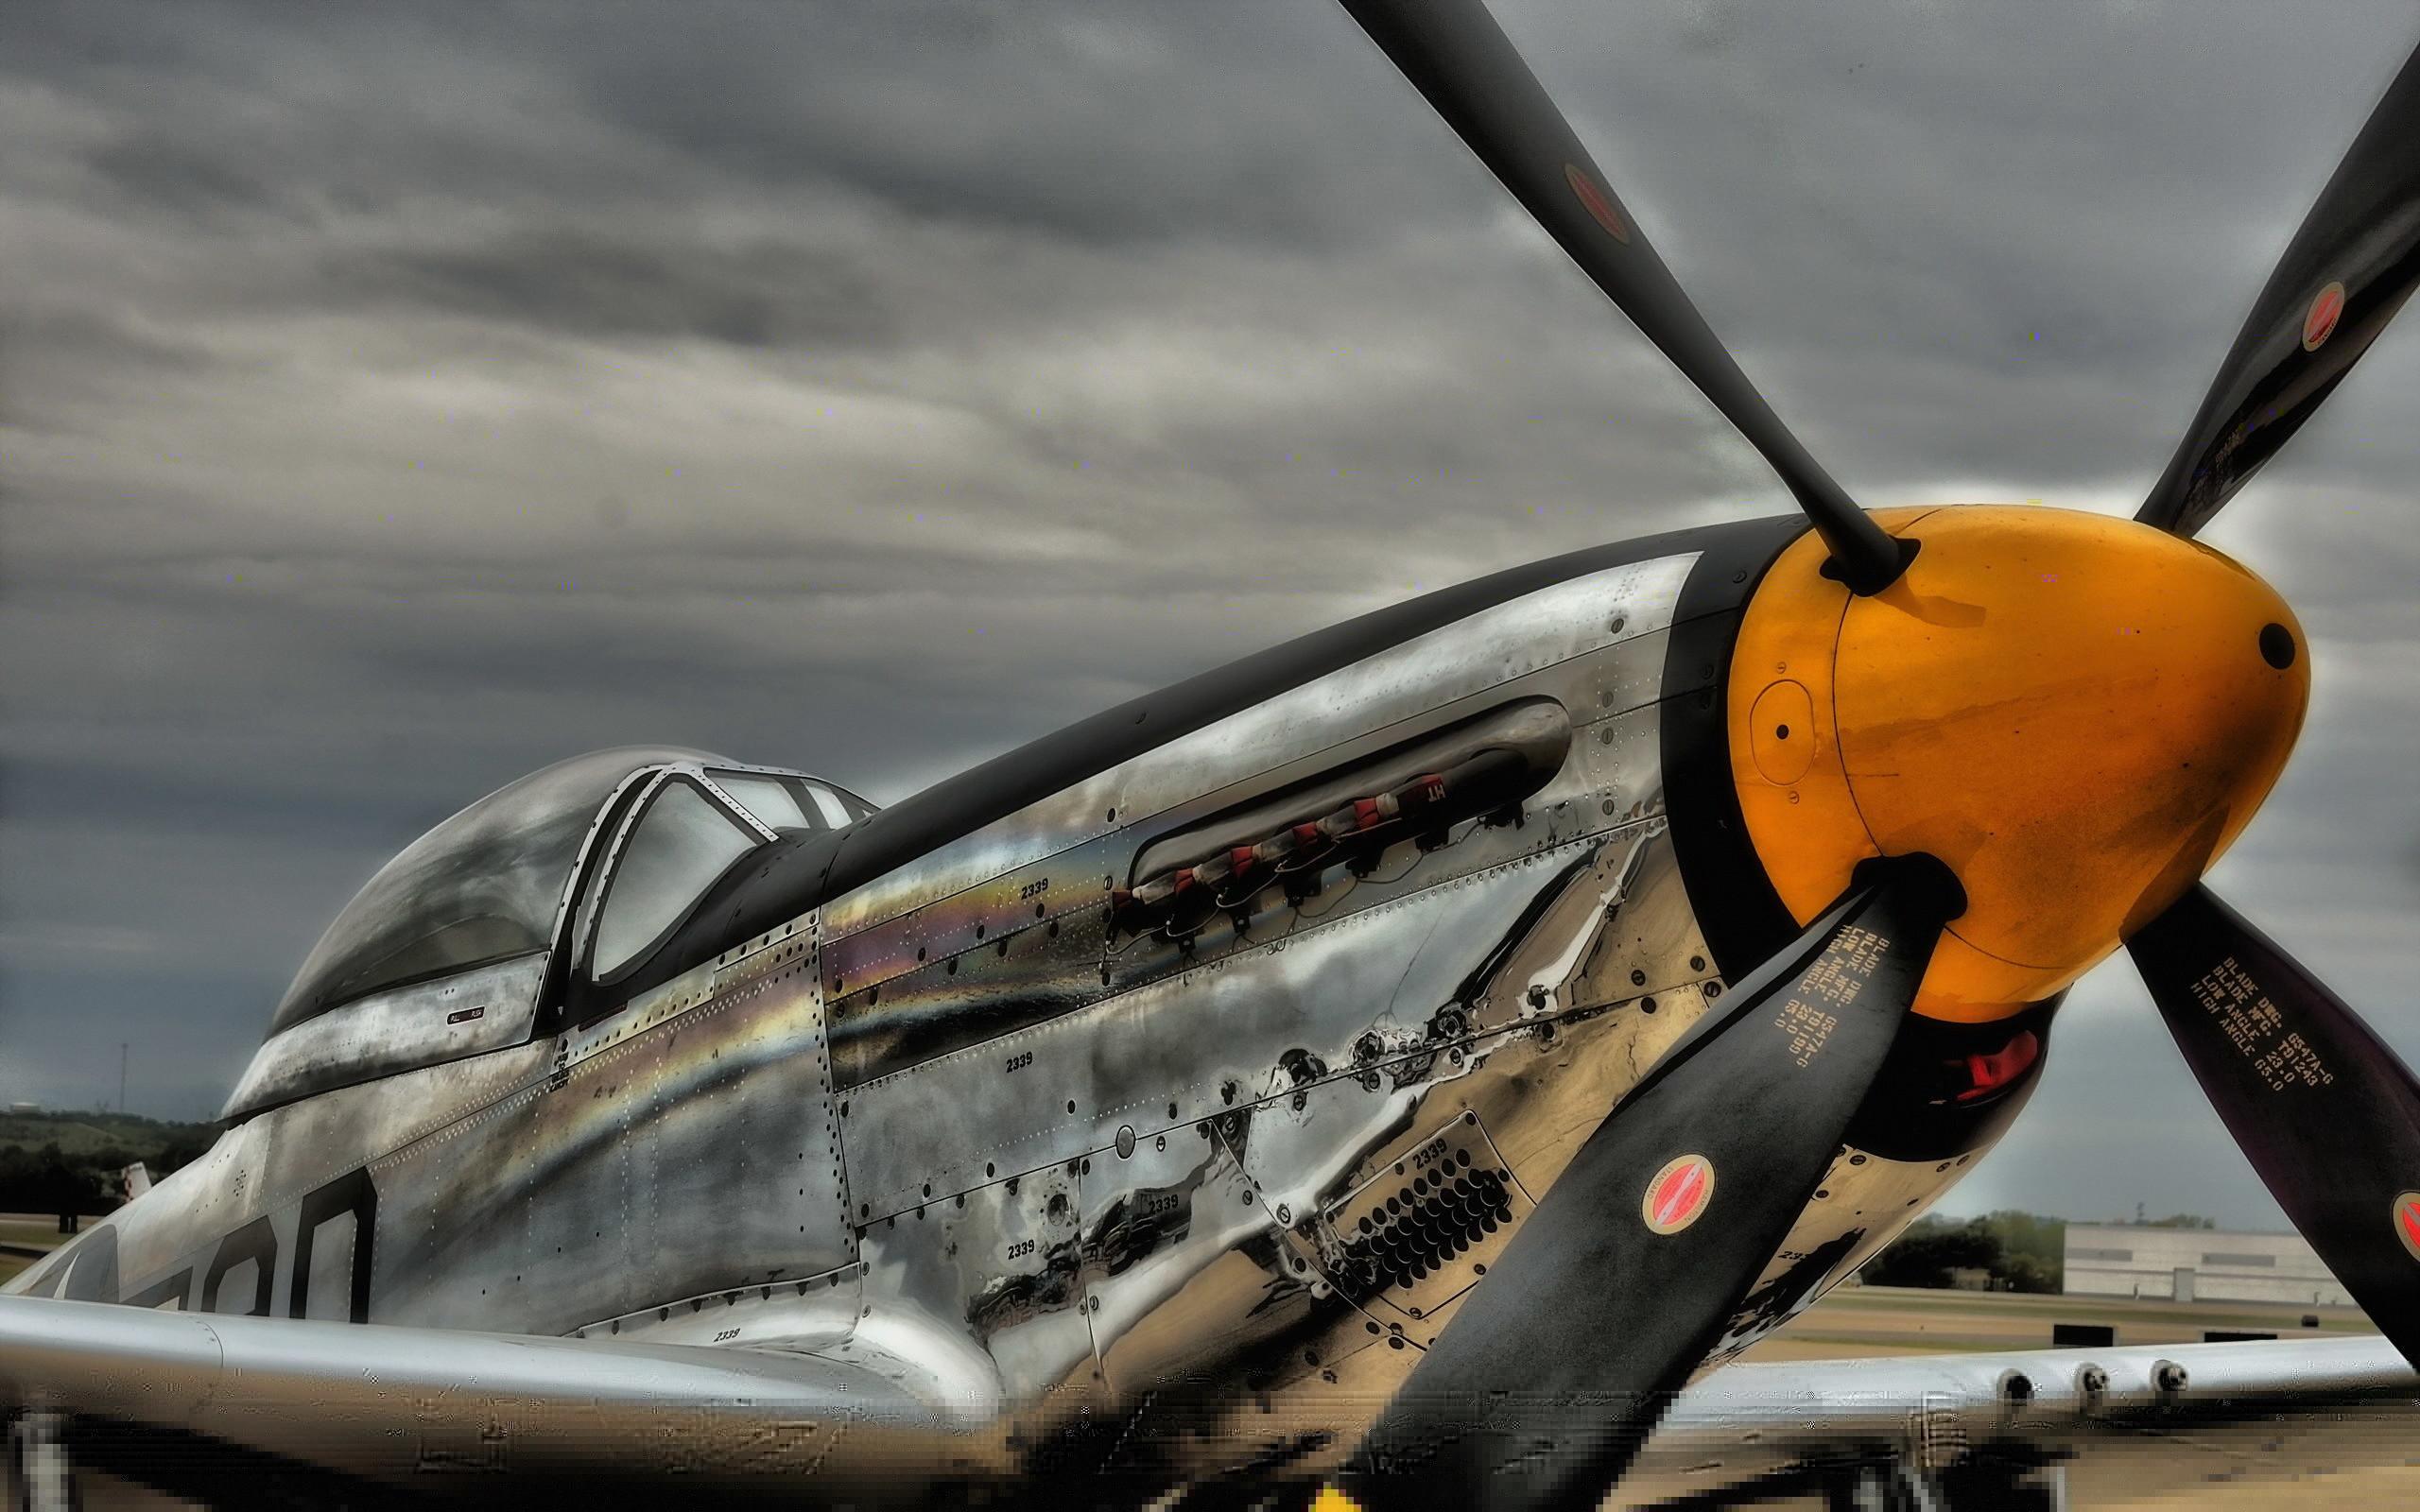 Wallpaper p51 mustang, airplane, aviation wallpapers aviation .